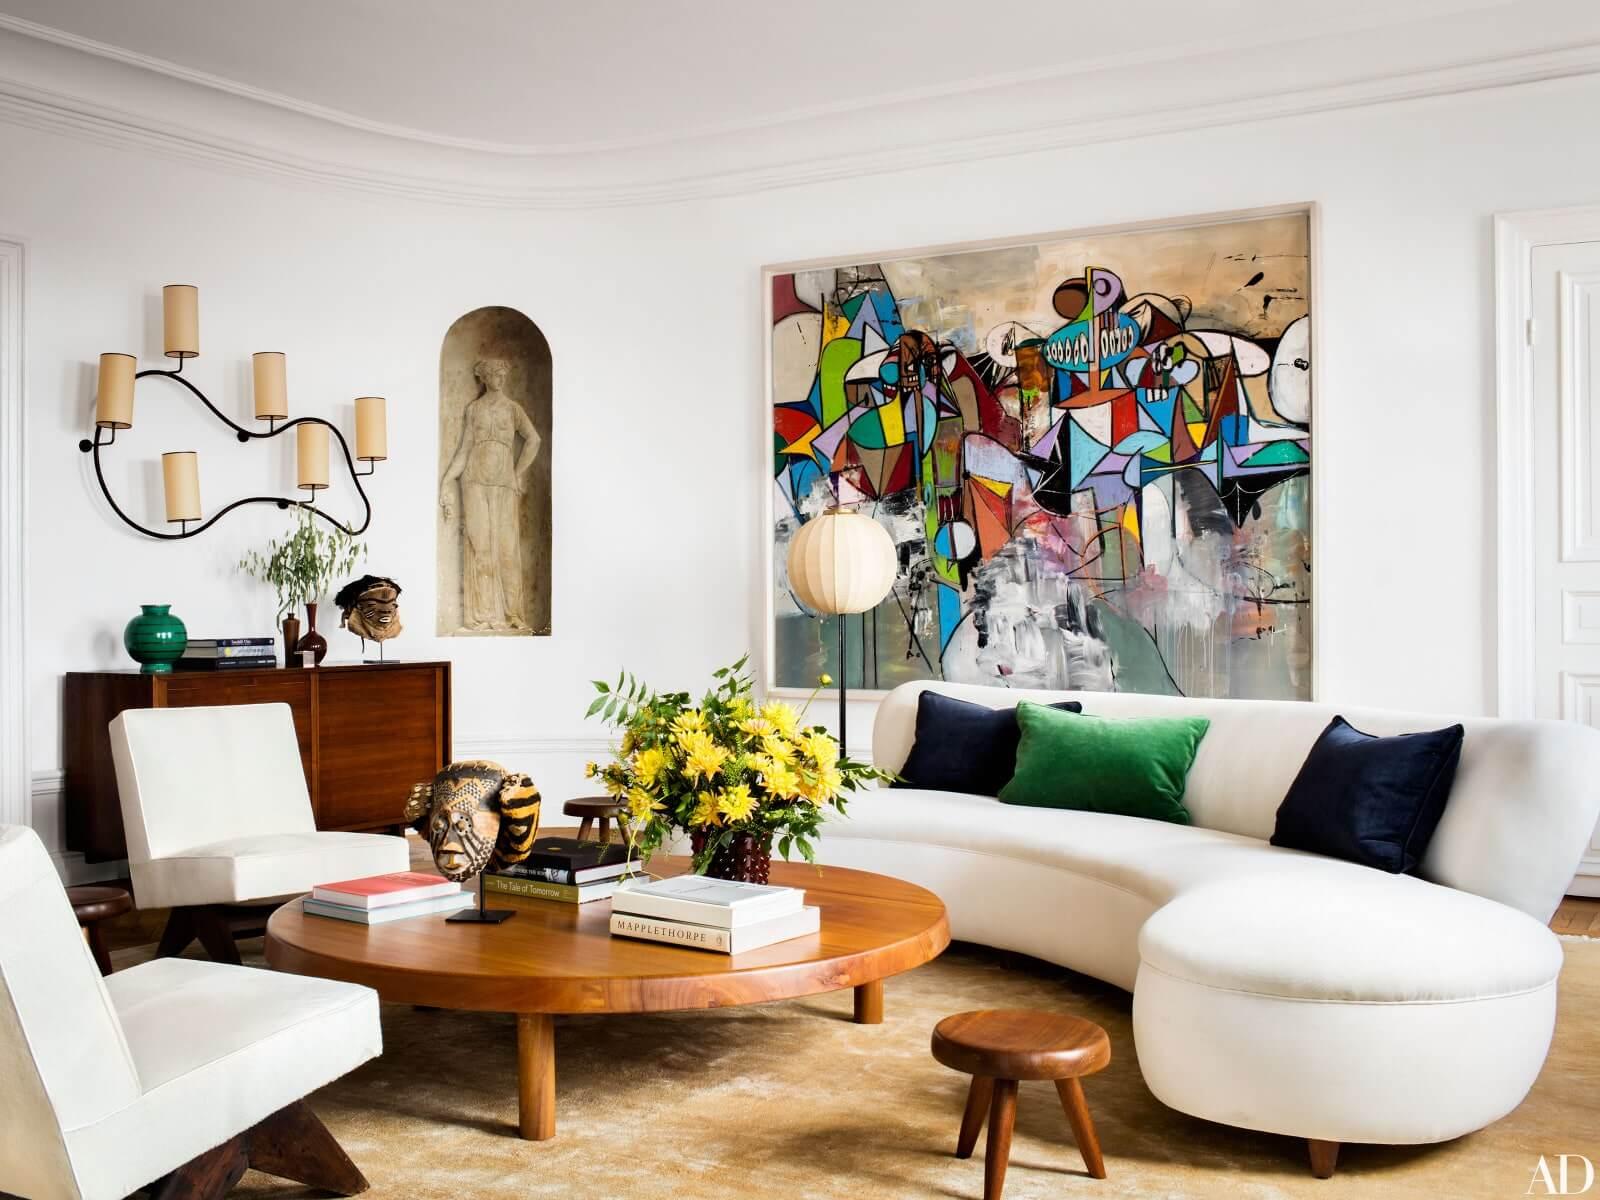 0916-giovanna-battaglia-stockholm-apartment-lede